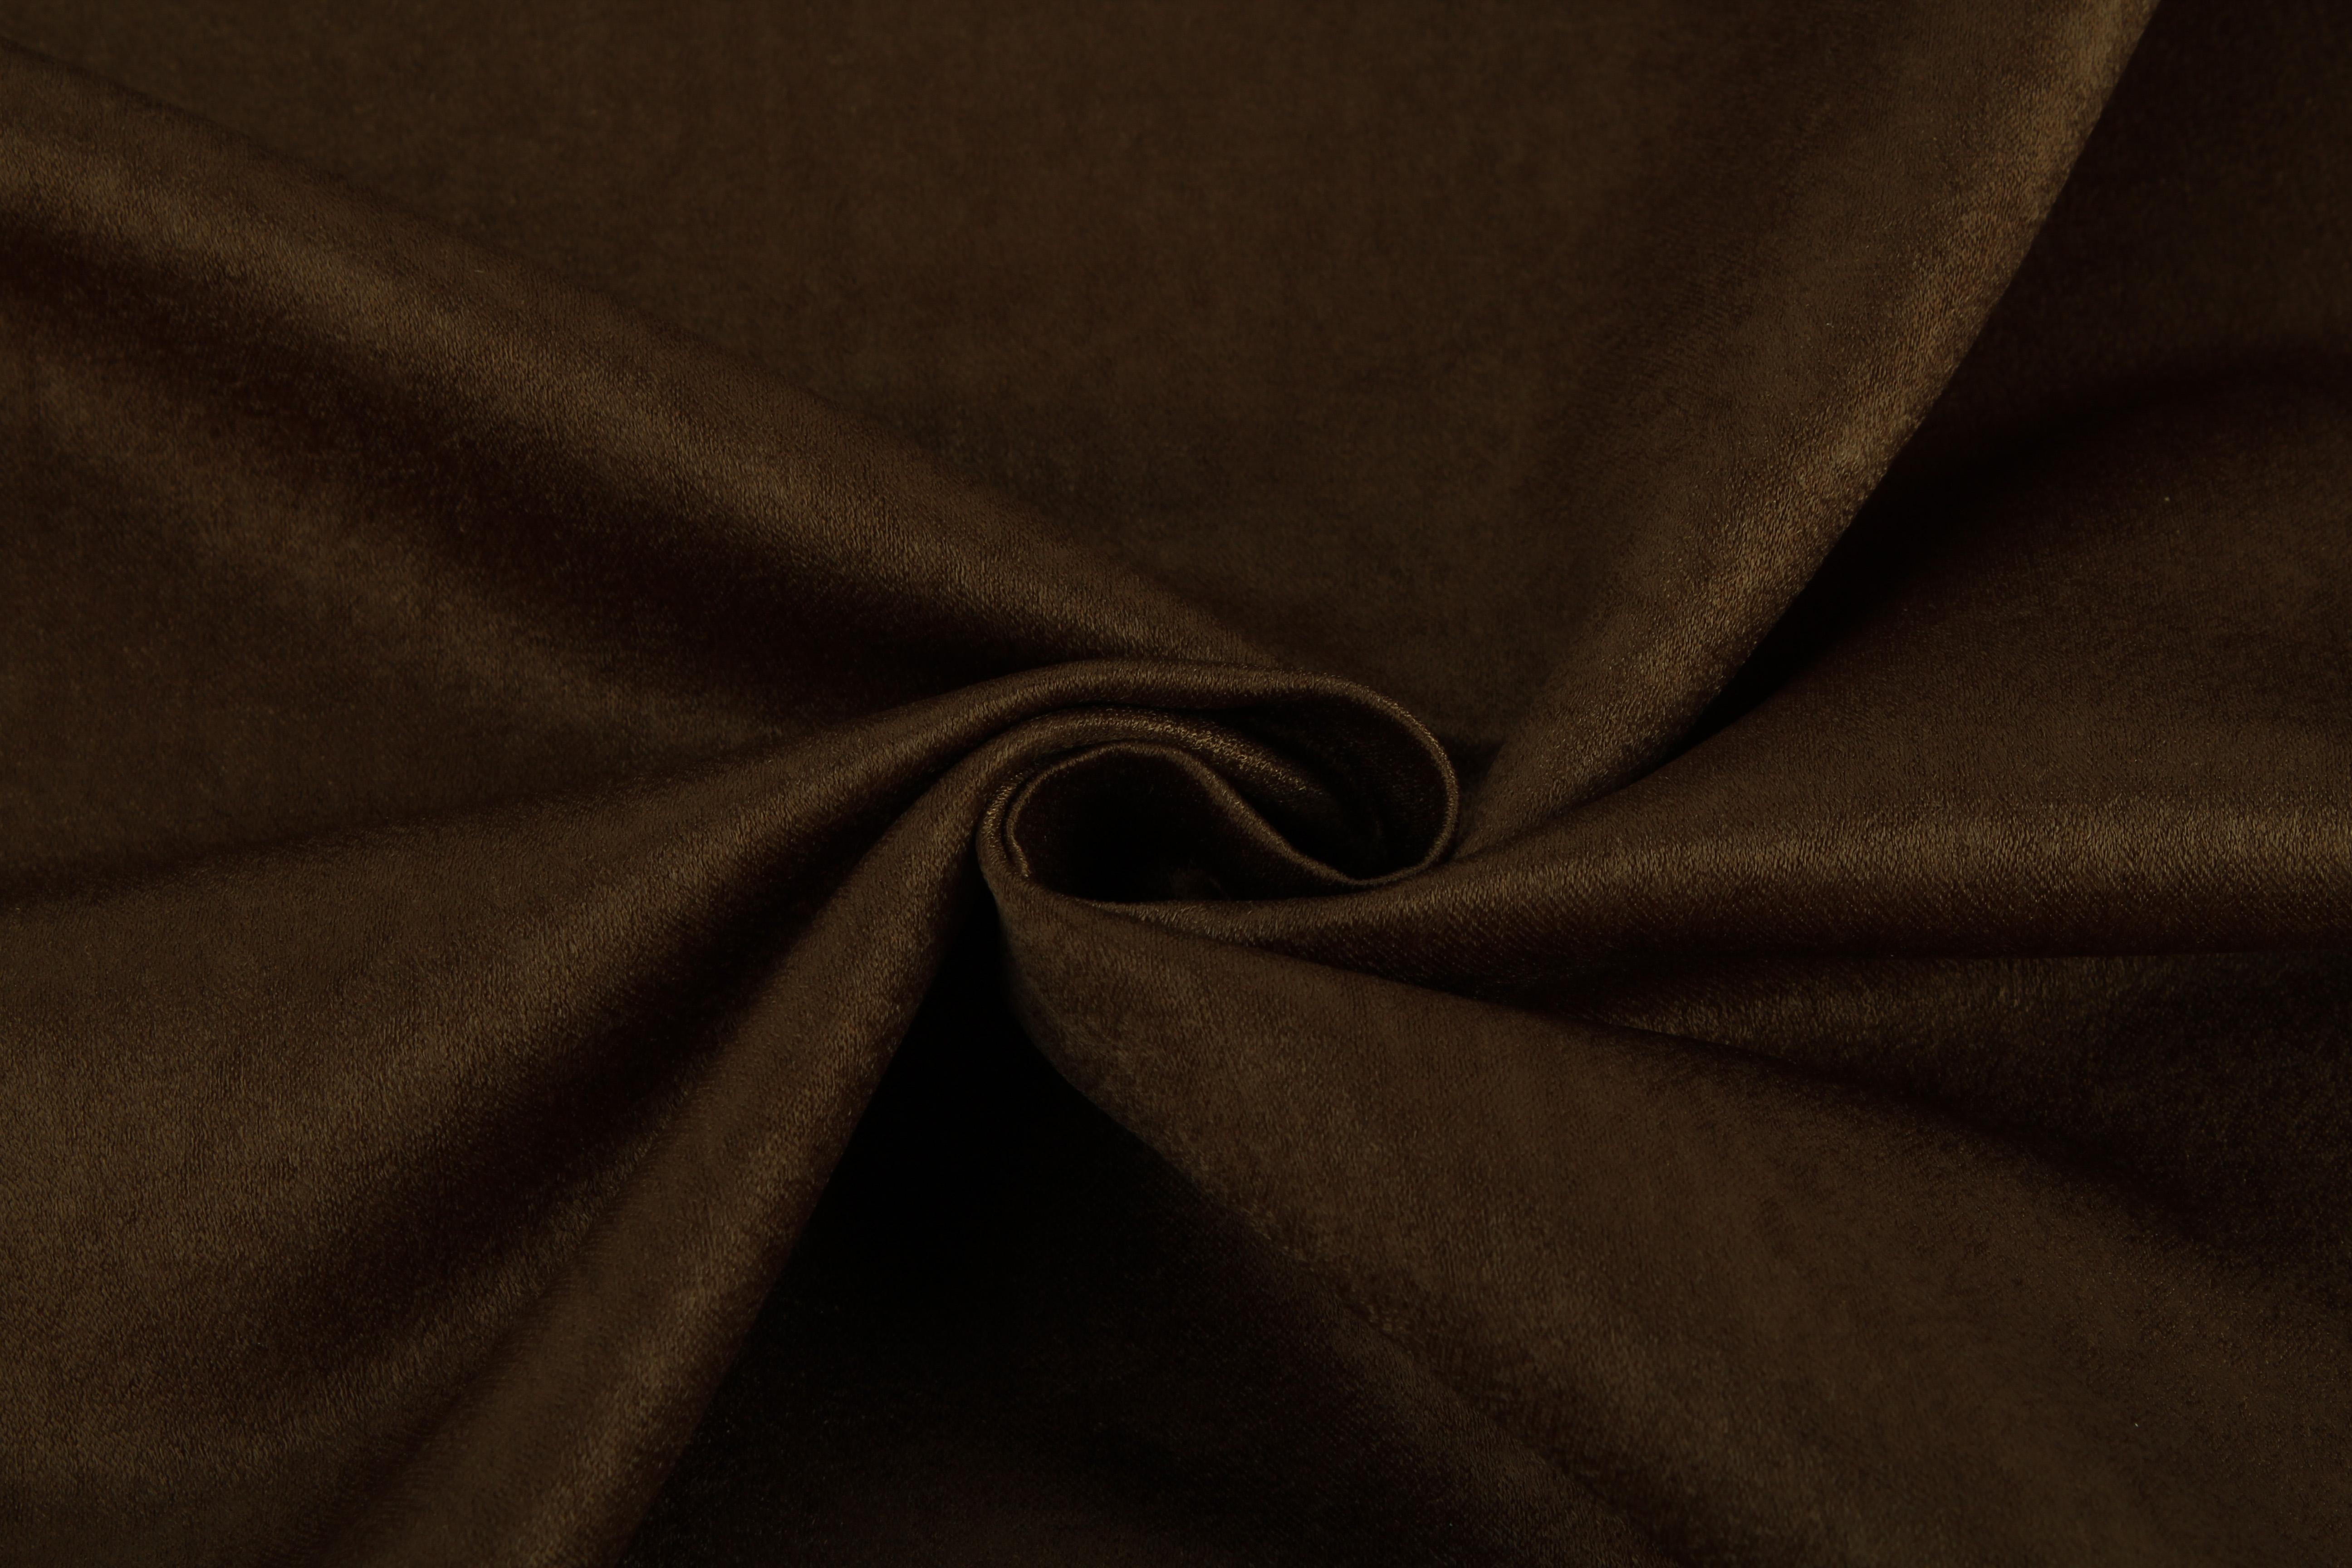 {} TexRepublic Материал Портьерная ткань Palette Цвет: Коричневый texrepublic материал портьерная ткань palette цвет брусничный